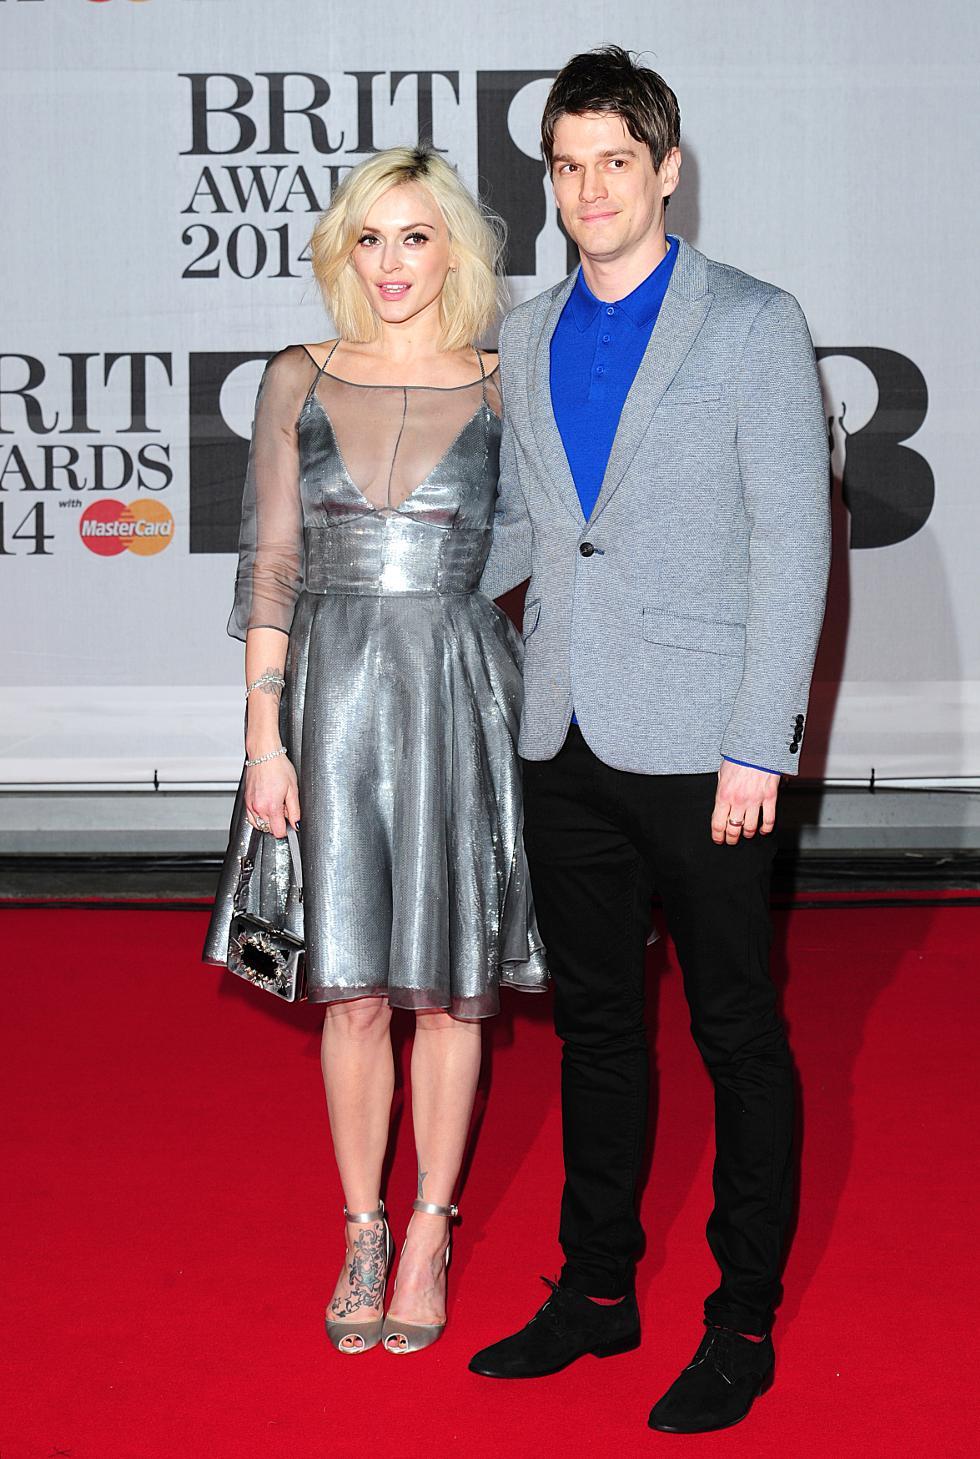 gallery_music-brit-awards-2014-fearne-cotton-jesse-wood.jpg